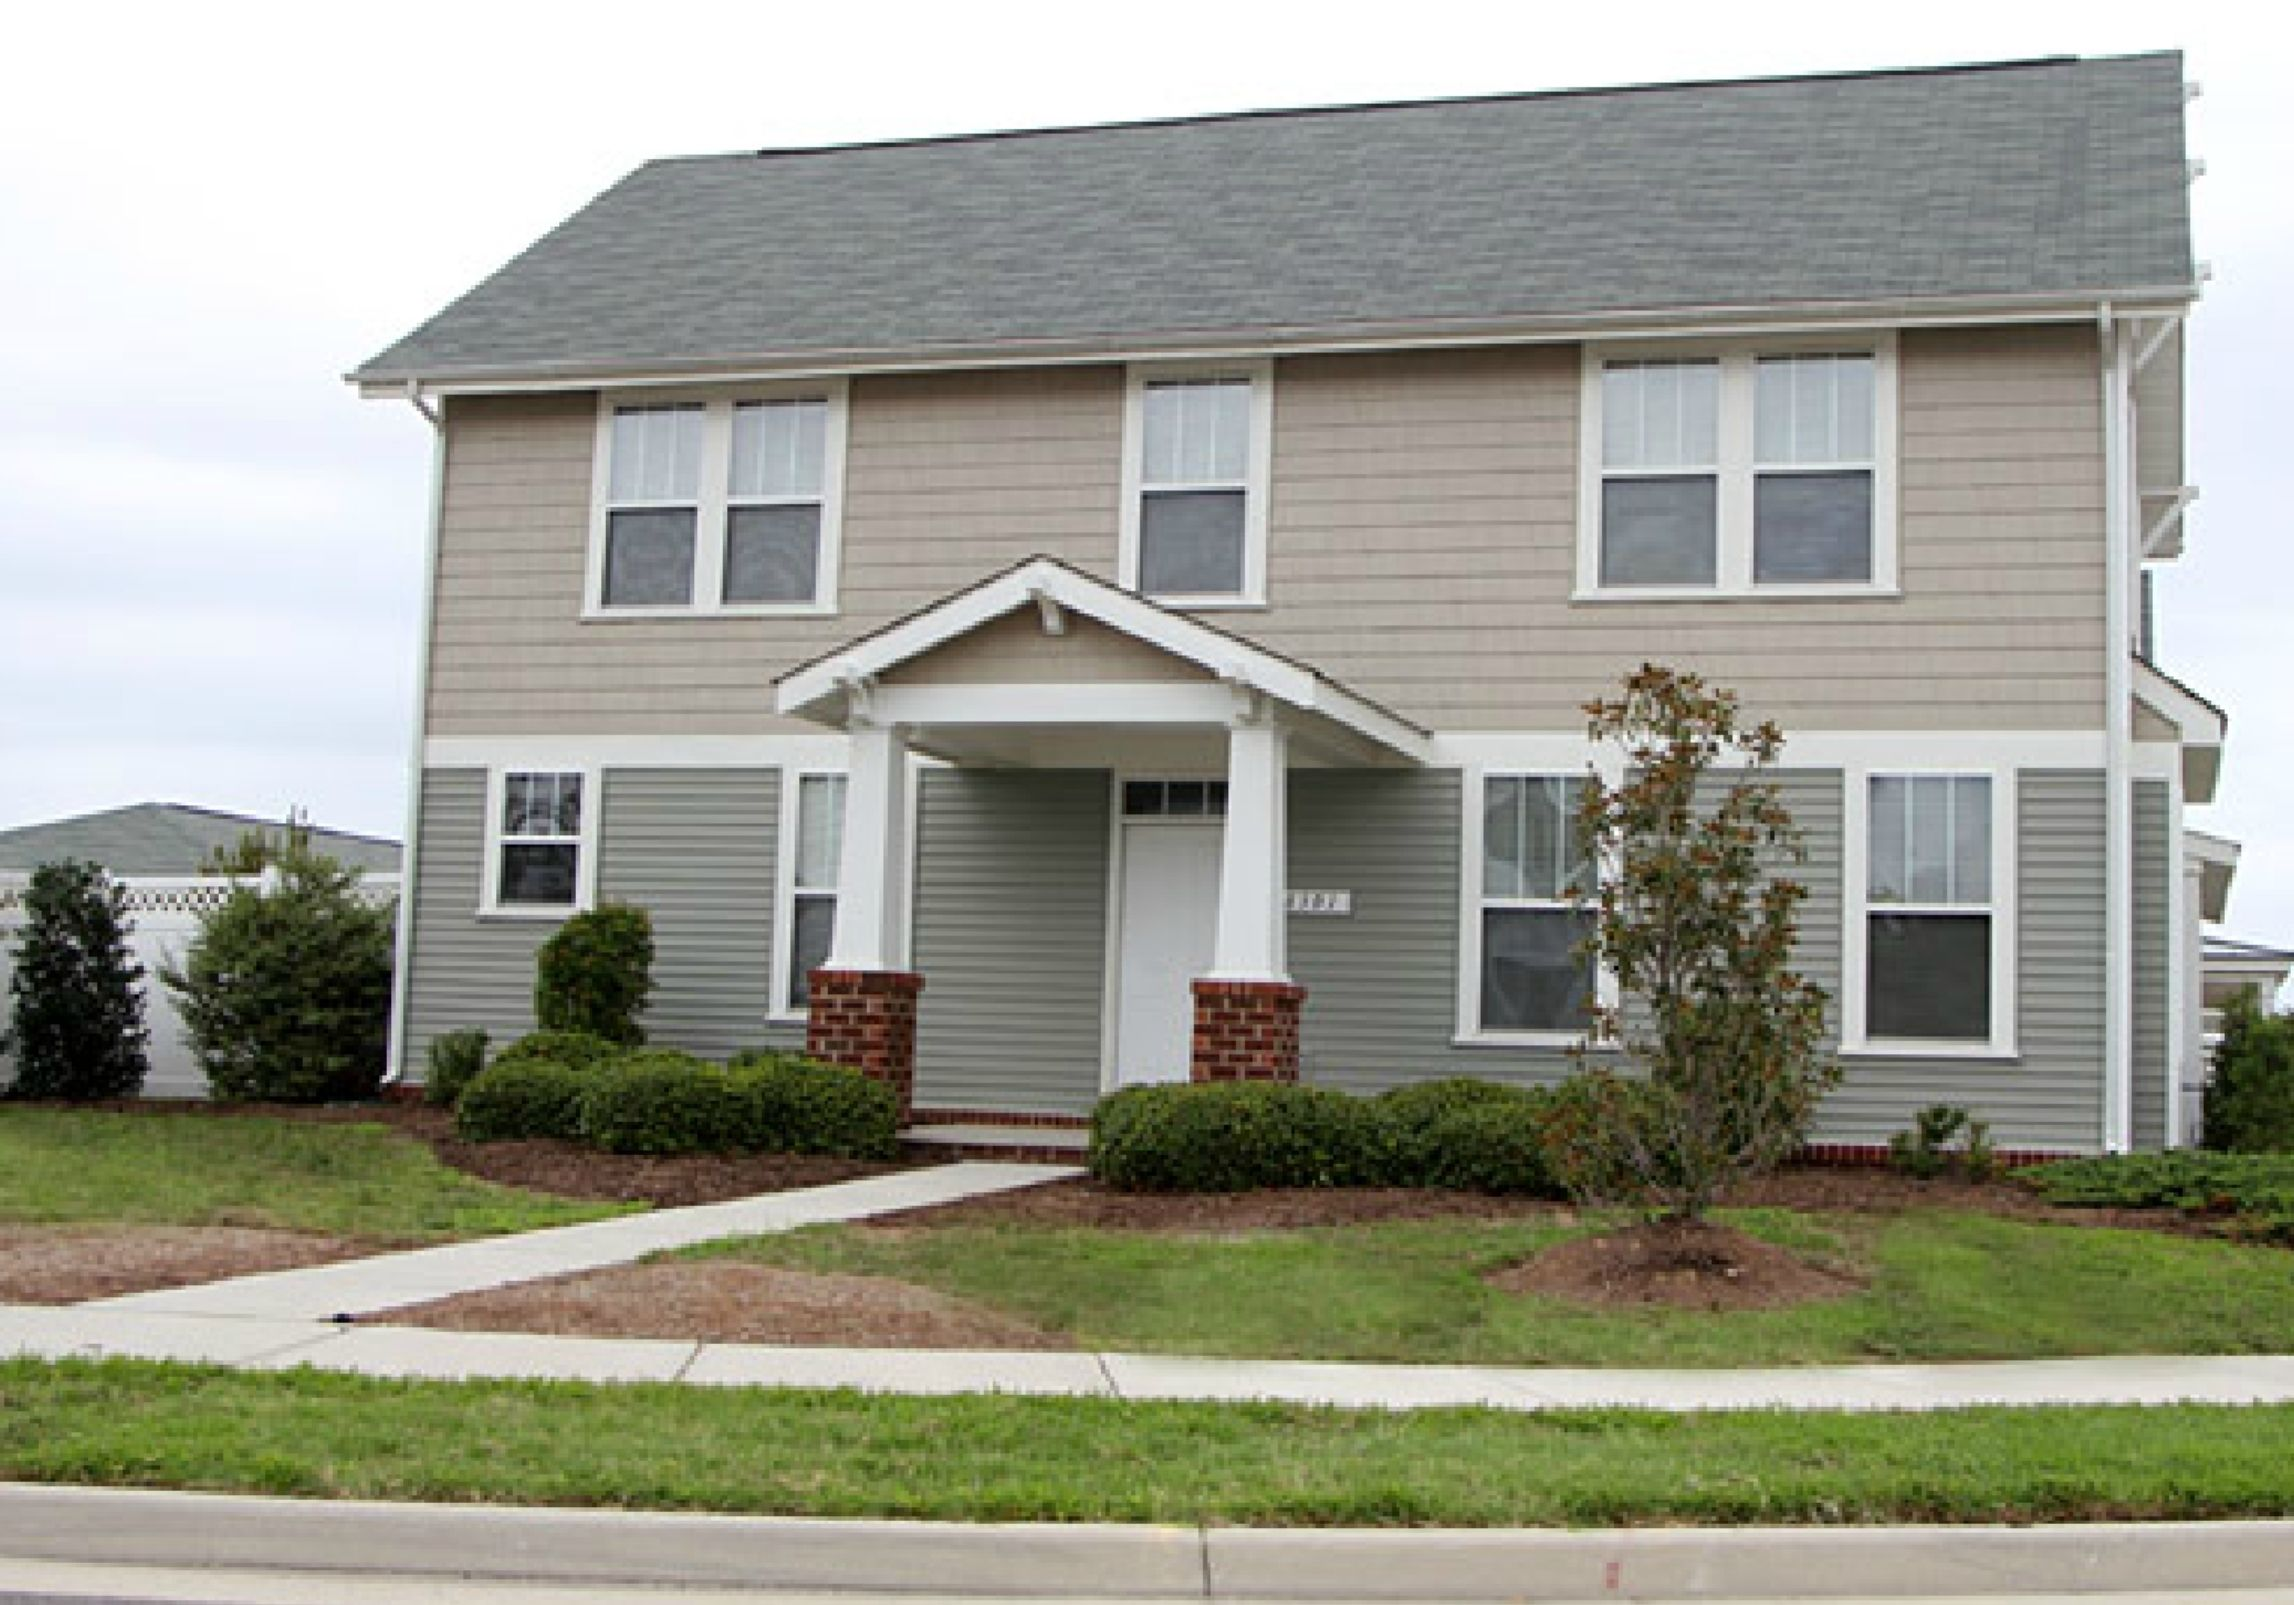 Military Base Housing Norfolk Virginia: The Village At Whitehurst Farm Neighborhood